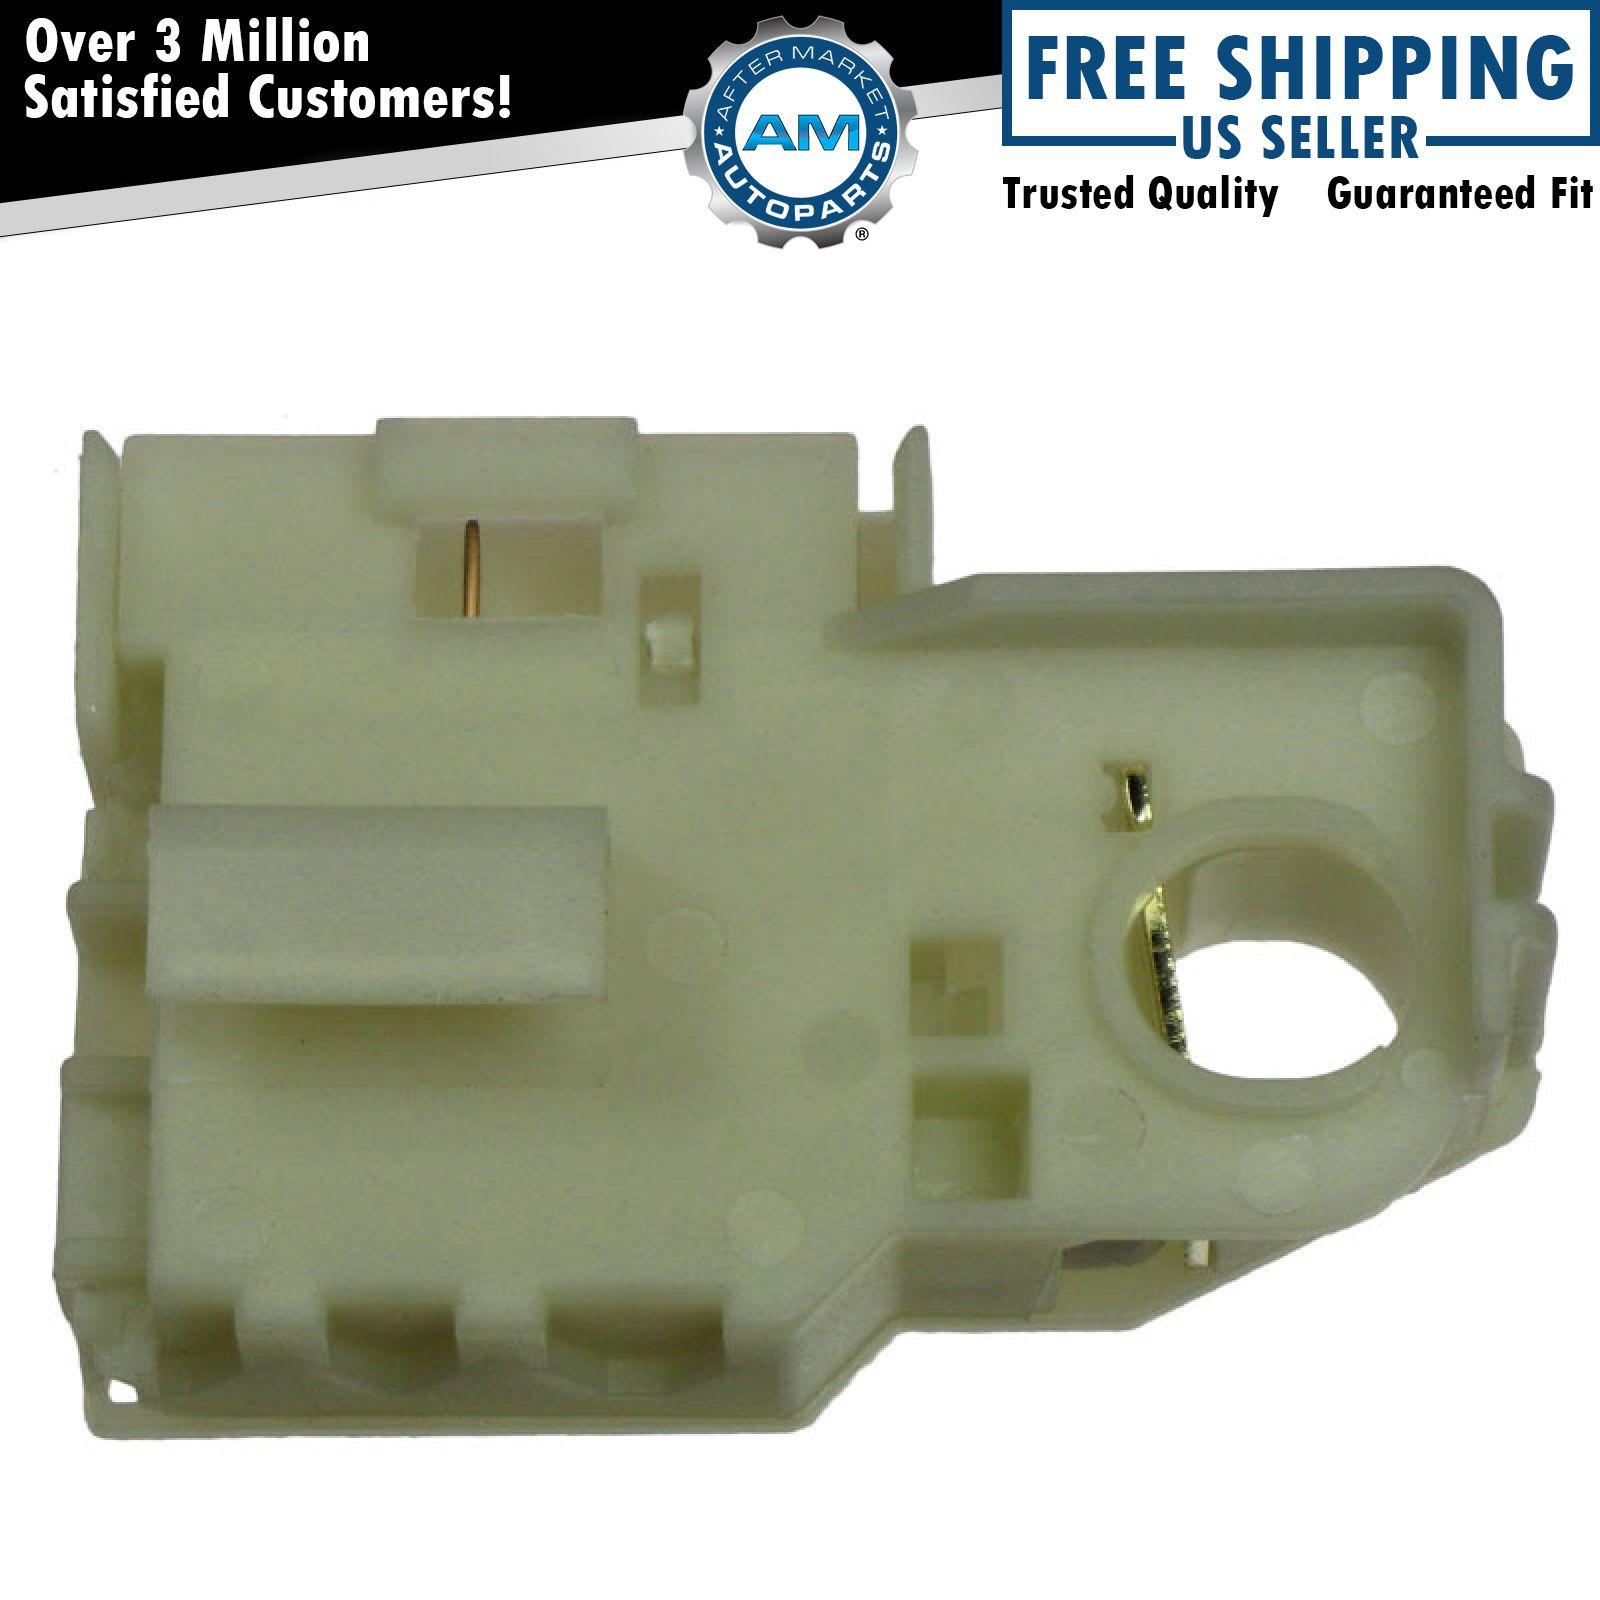 1A Auto Brake Stop Light Lamp Switch for Chevy C//K Suburban GMC Yukon Pickup Truck